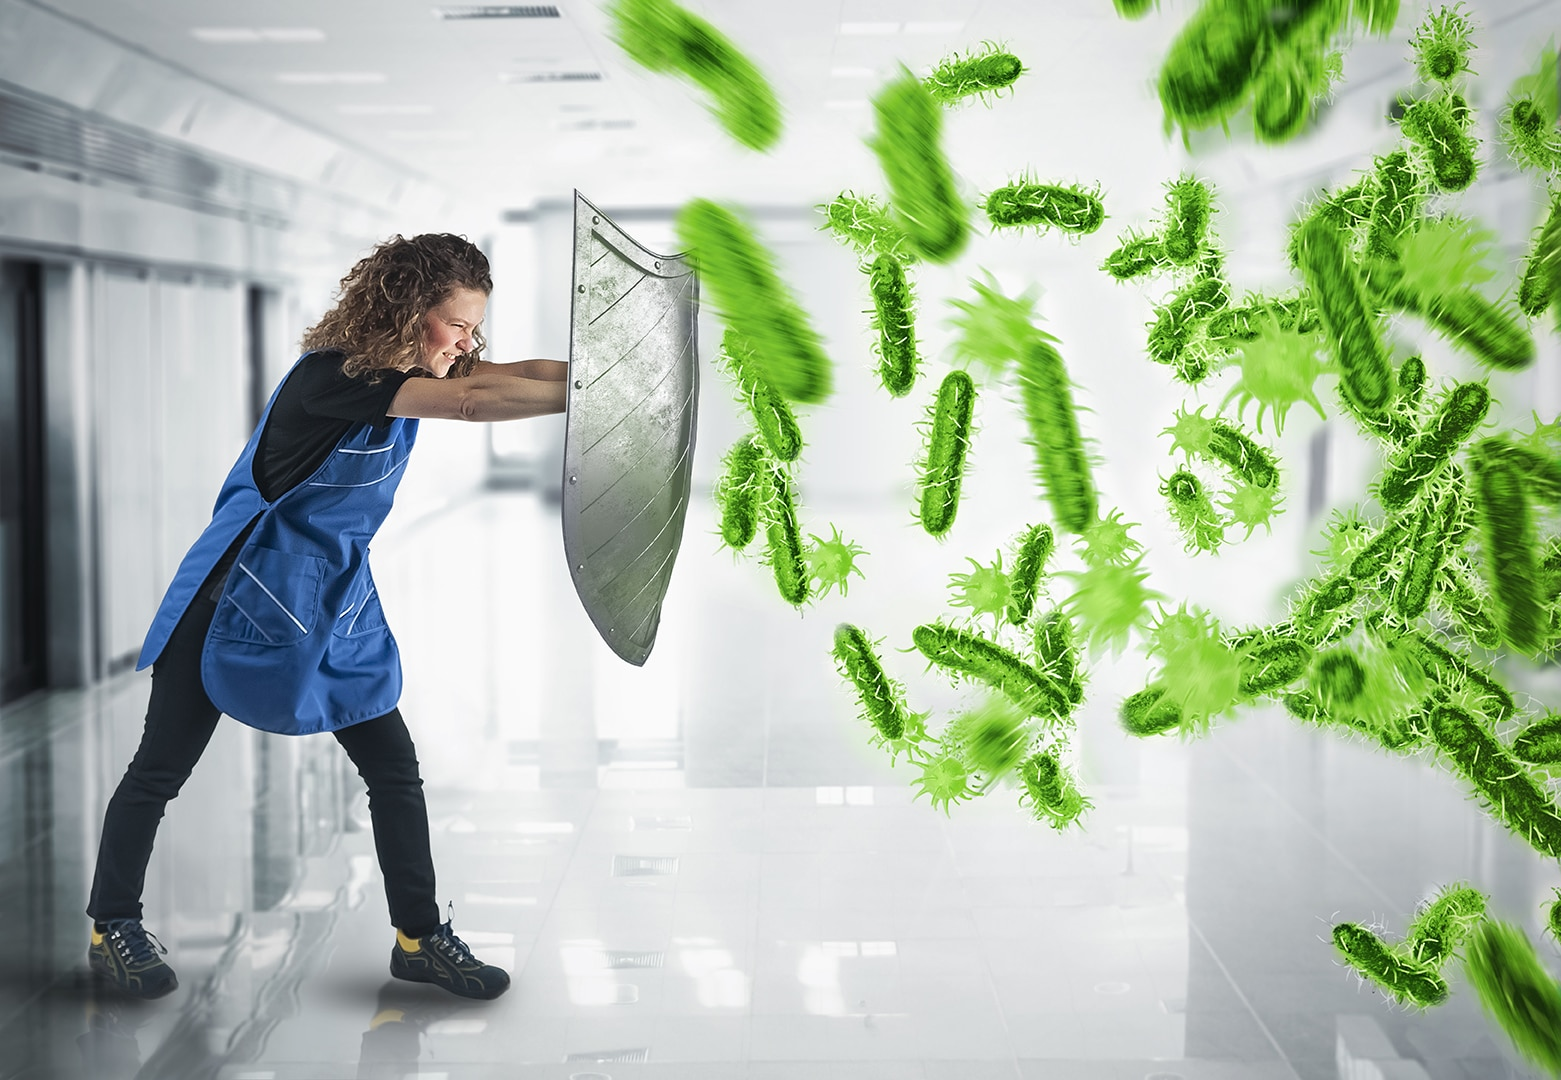 3D Rendering attack of bacteria